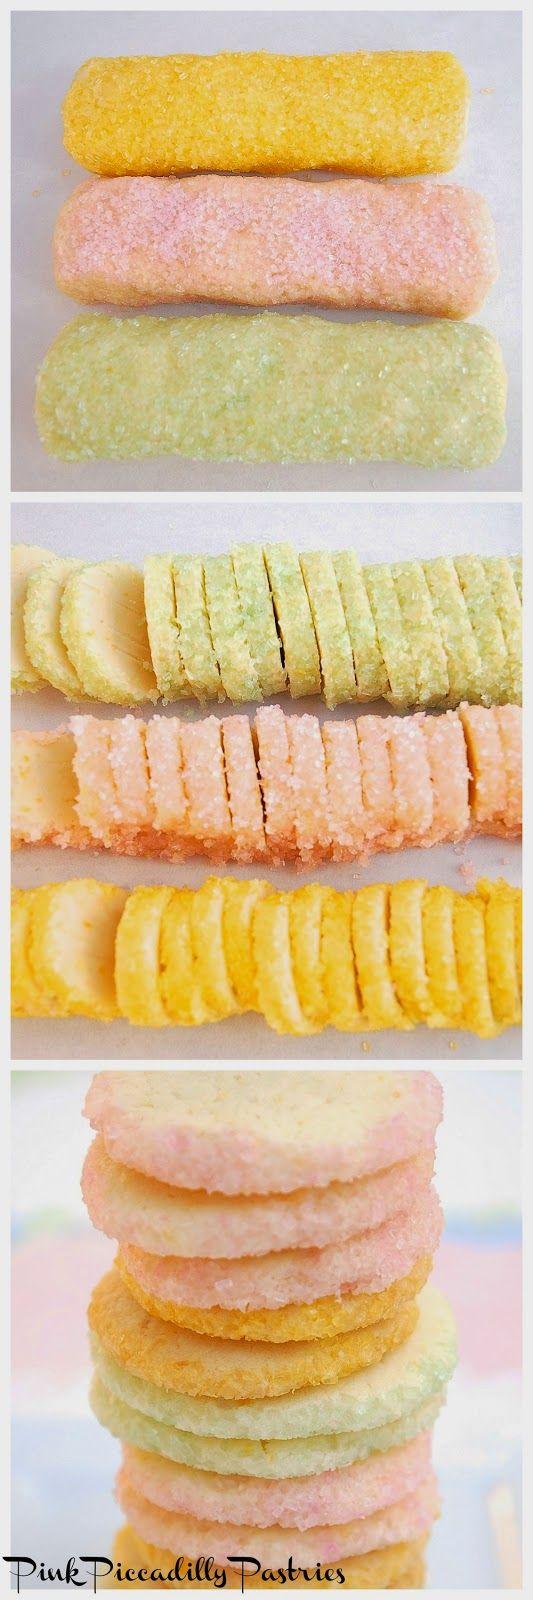 This weekend I tried Martha Stewart's Lemon Icebox Cookies Recipe.    They were sooo good - light, lemony, buttery good!!   I cou...